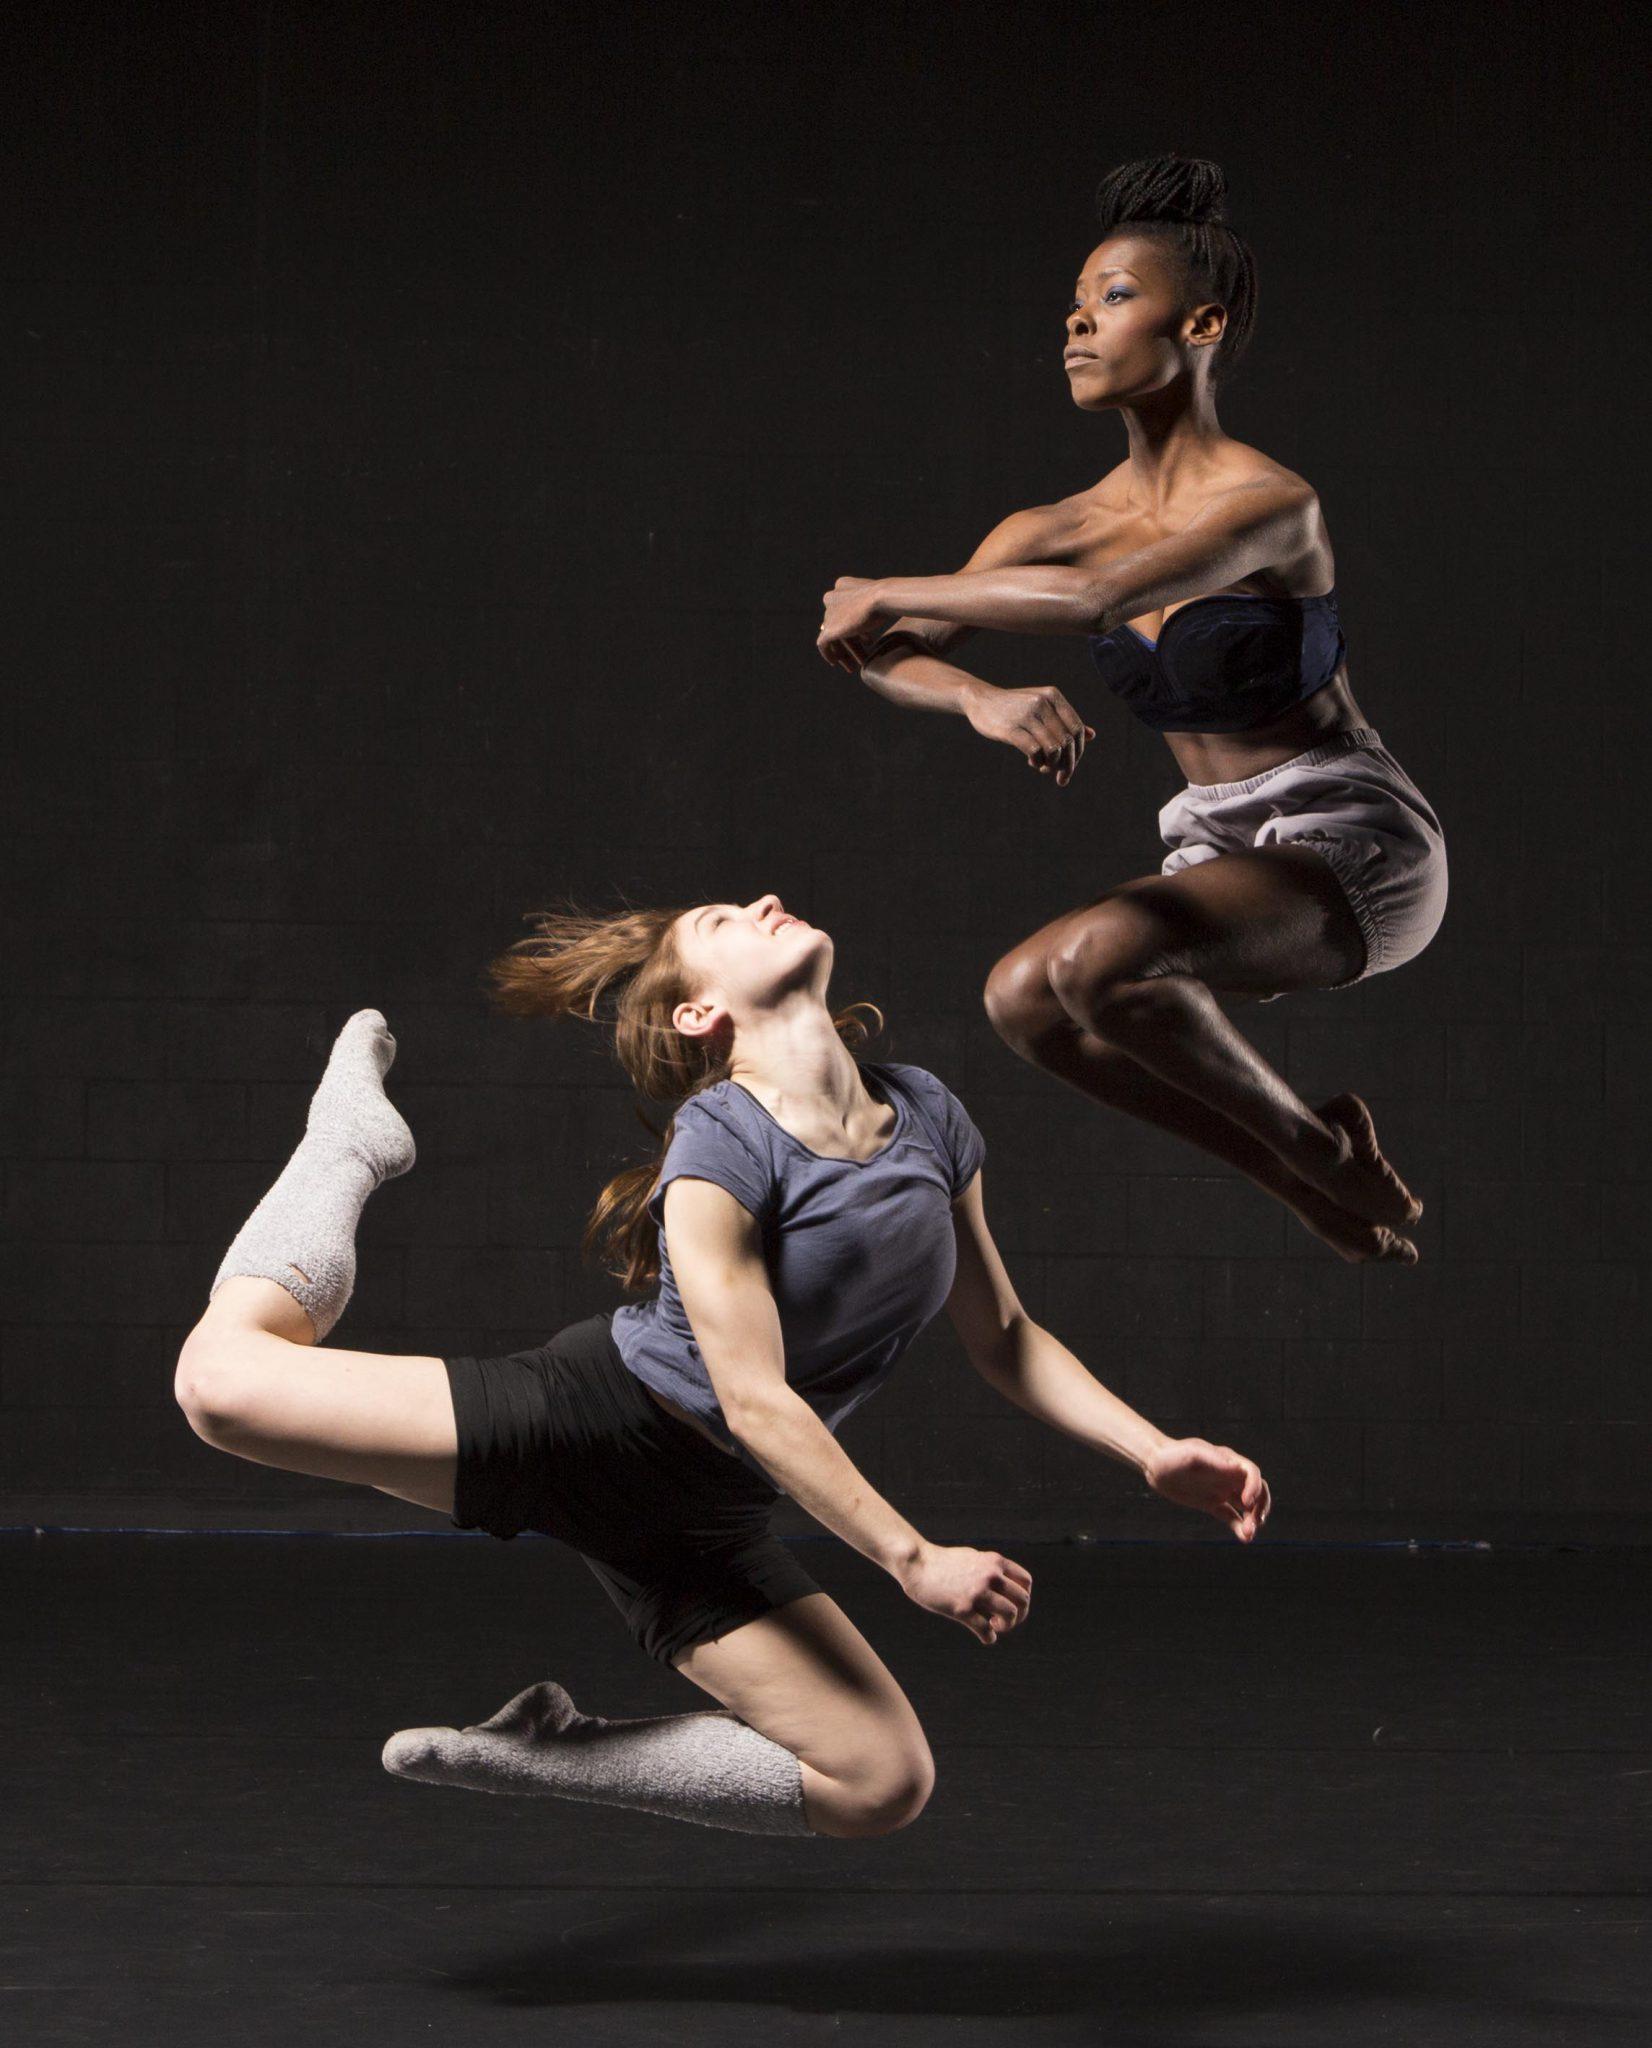 танцы фото 18